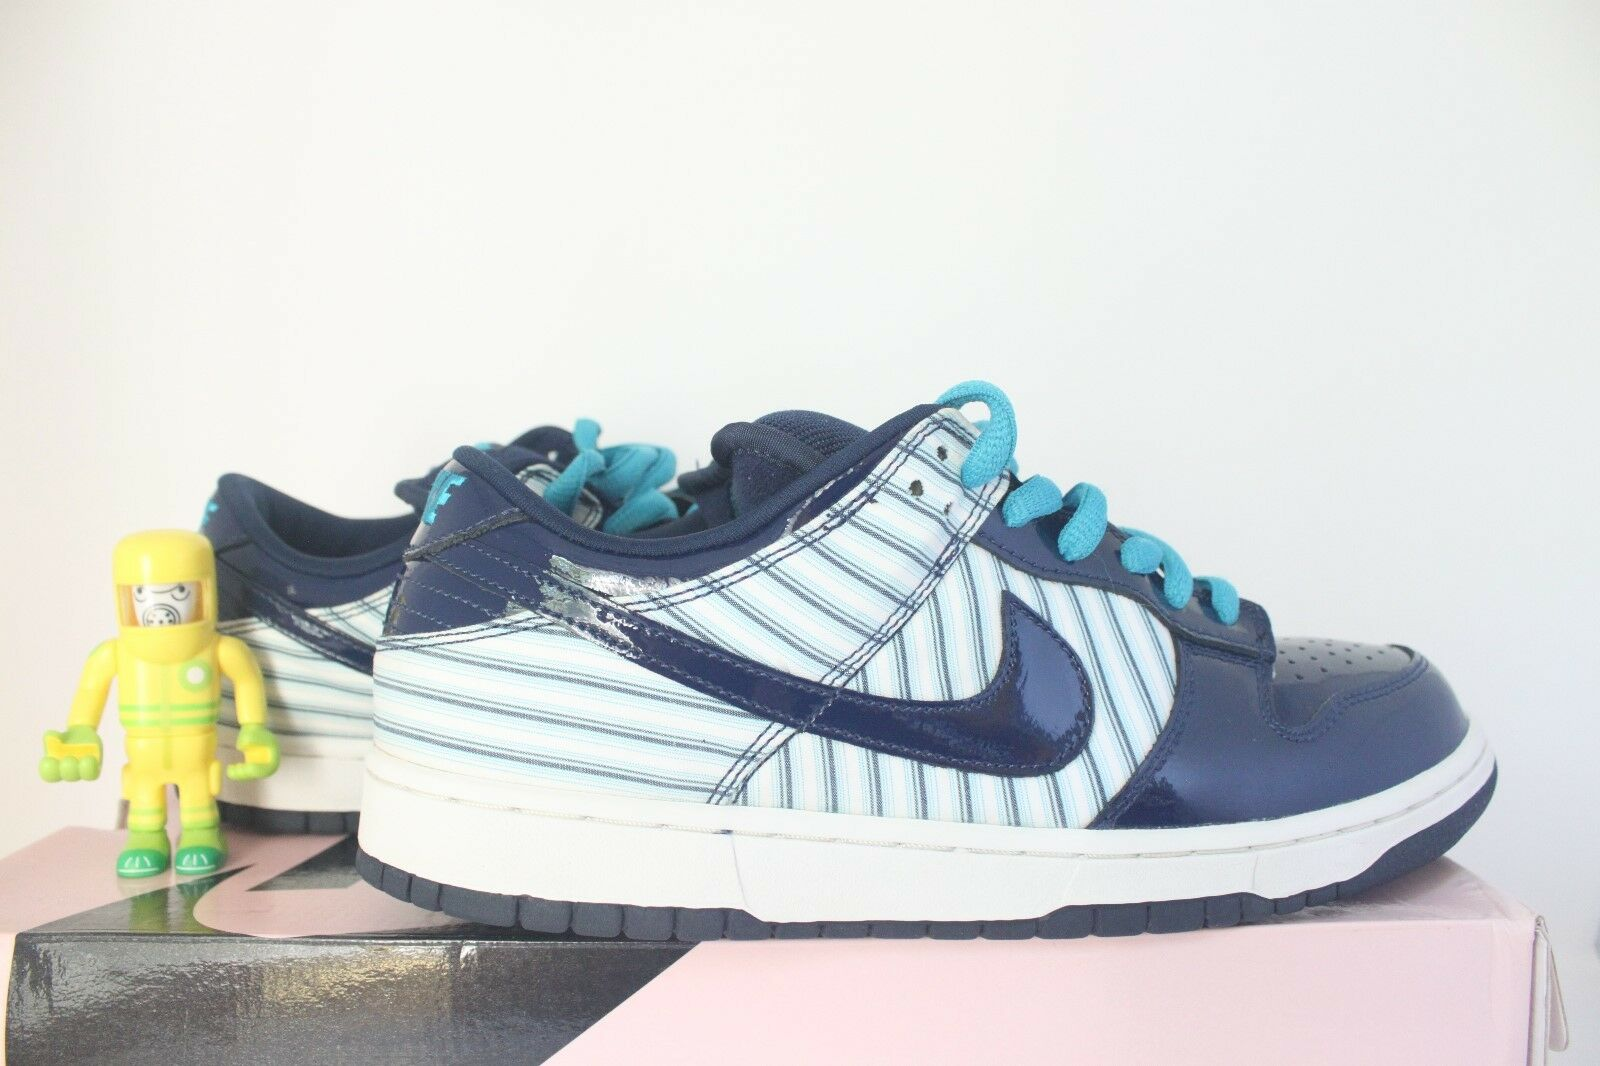 85b9b103db9 Nike SB bluee Avenger PL SZ DS patent banker pinstripe 312710-141 leather  10.5 nizrrw3419-Athletic Shoes